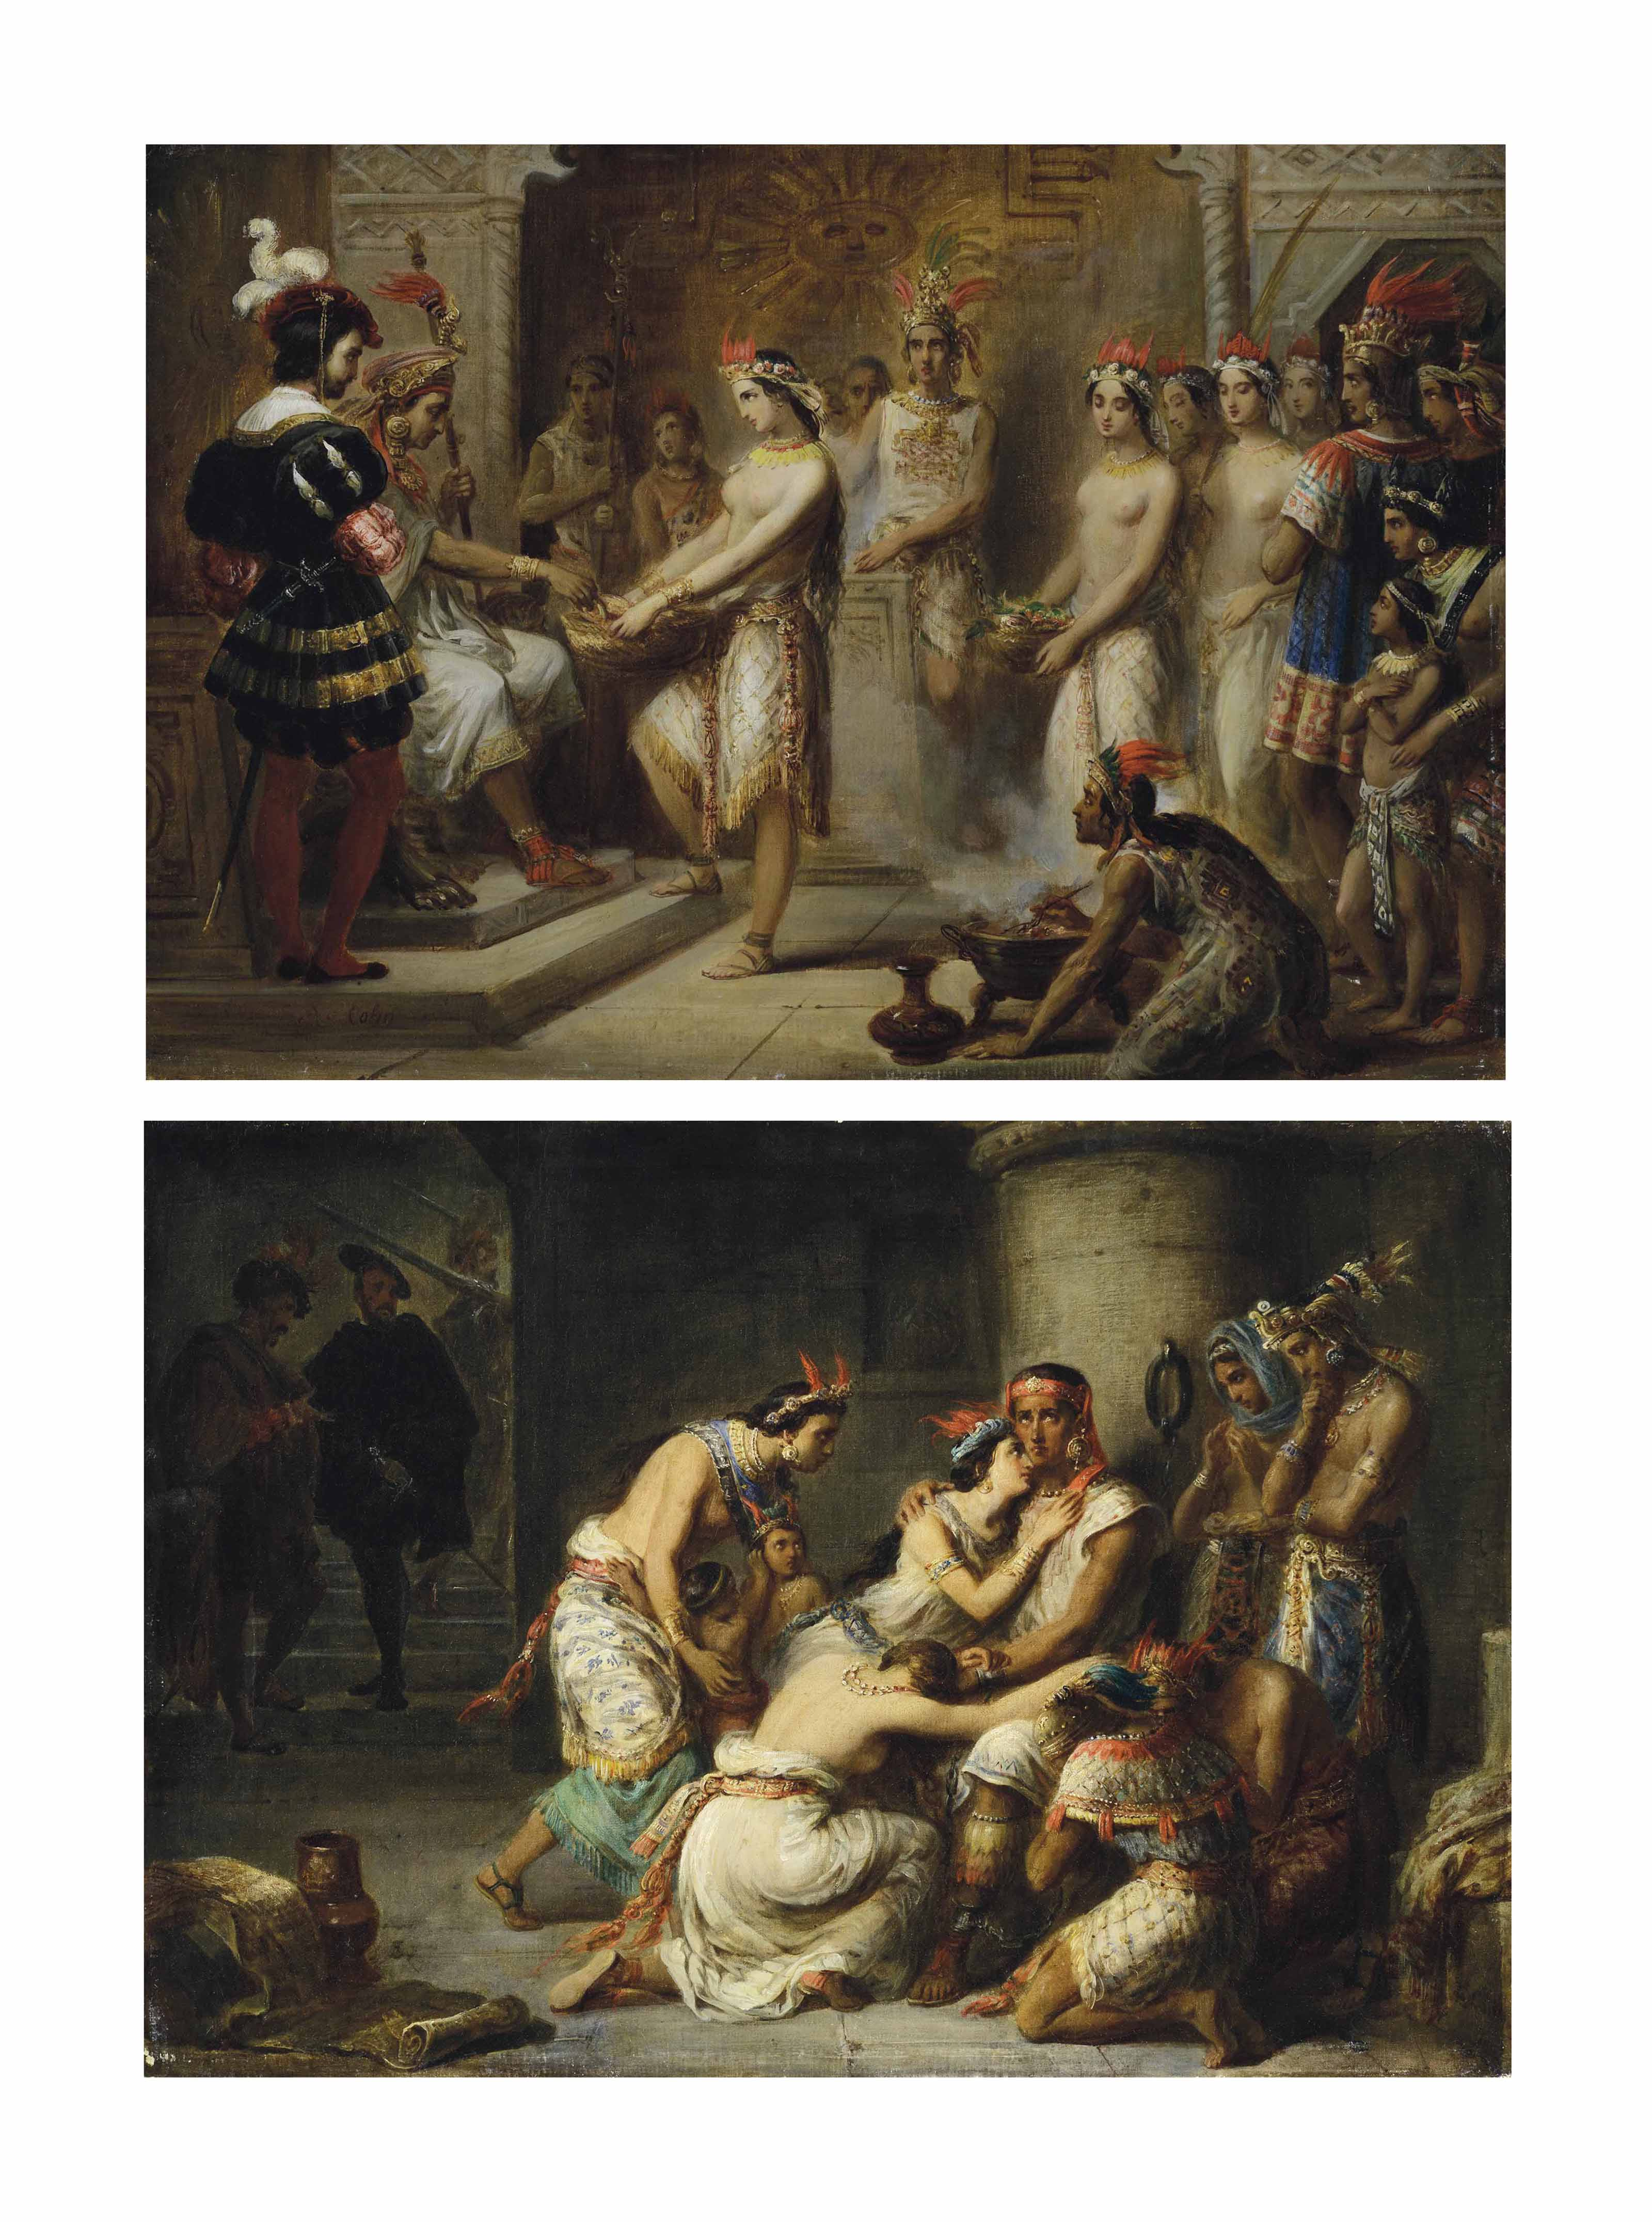 Ataliba (Atahualpa) recevant de ses sujets la rançon qu'il doit verser à Pizarre; et Ataliba (Atahualpa) et sa famille réunis en prison